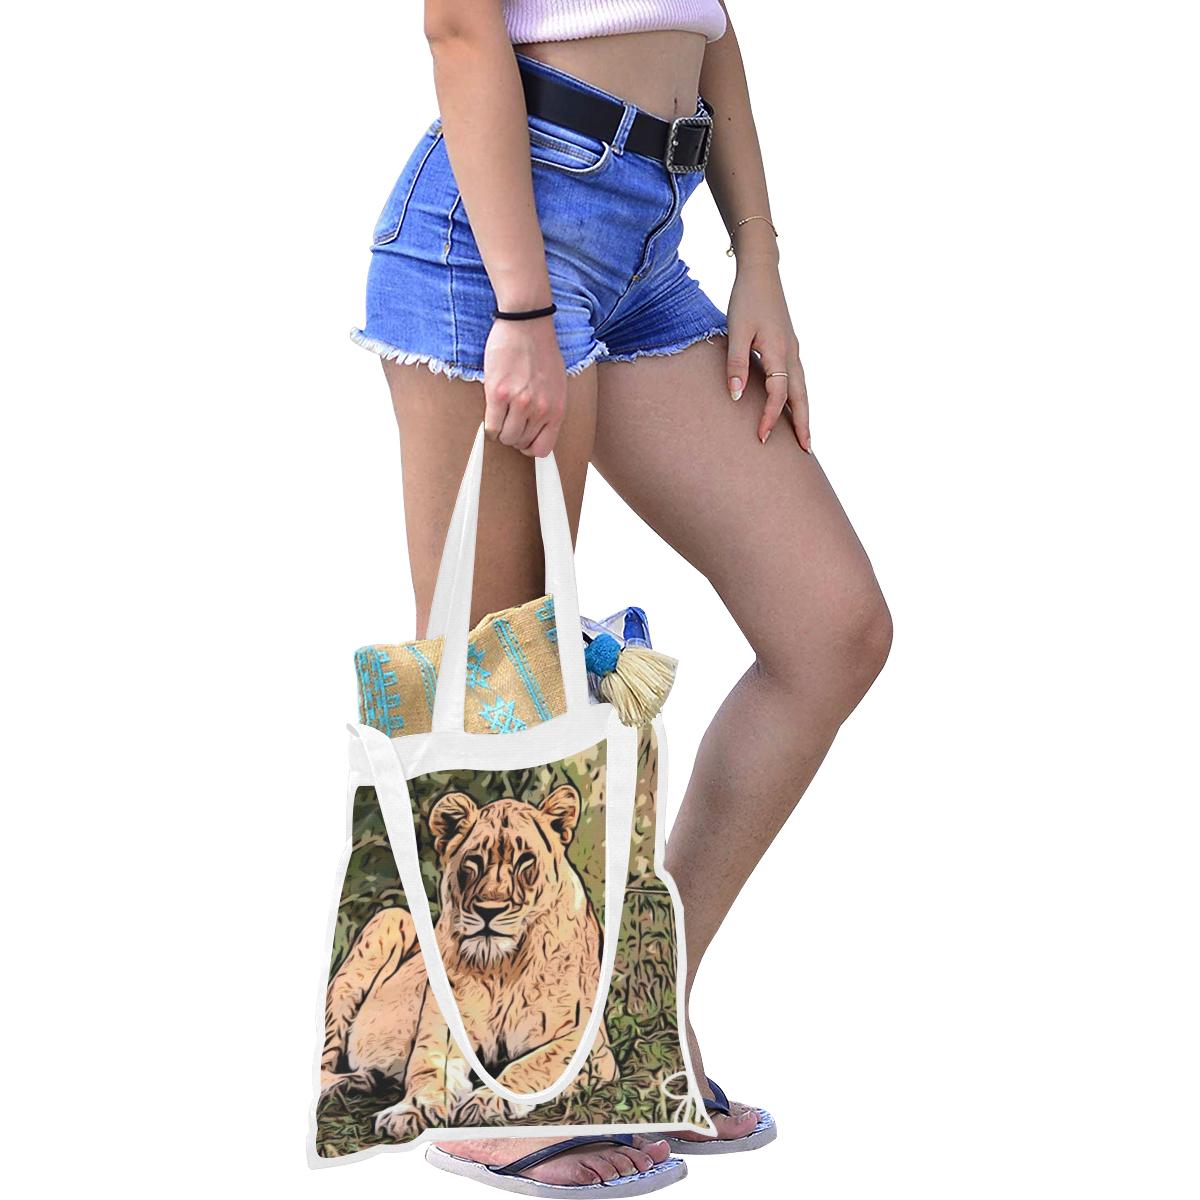 Lioness Of Love Canvas Tote Bag/Medium (Model 1701)